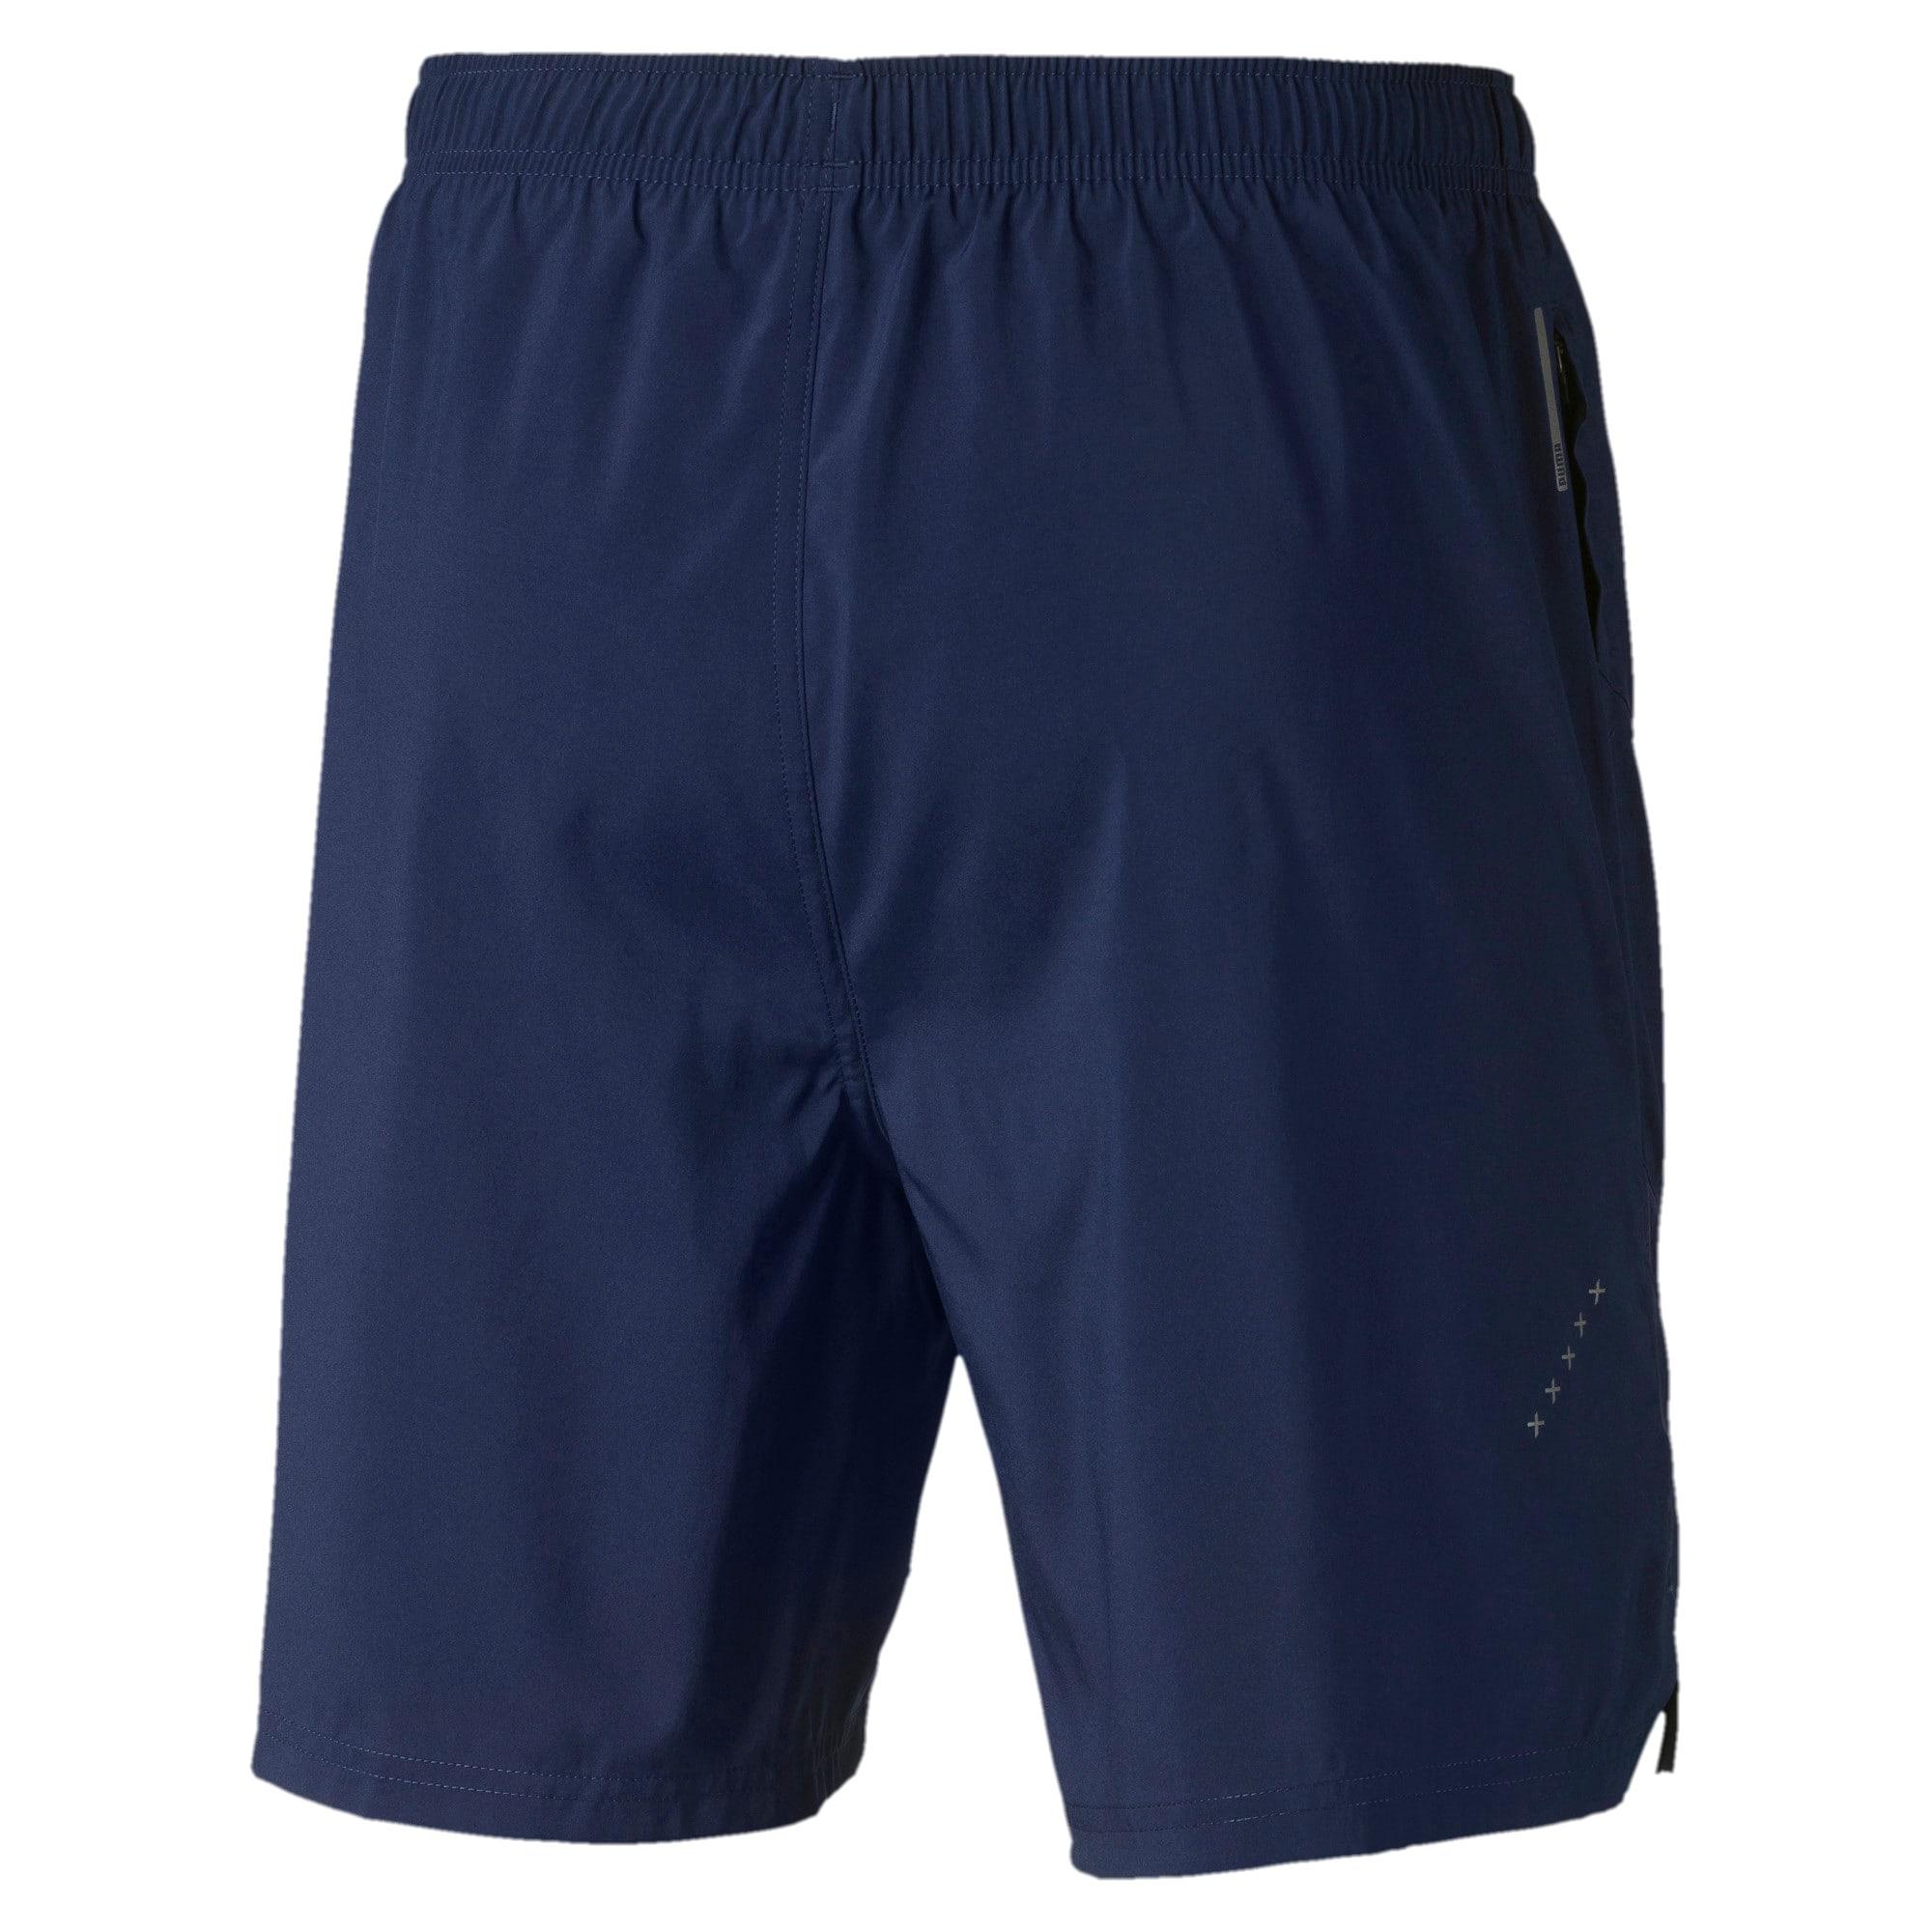 Thumbnail 5 of IGNITE Woven Men's Training Shorts, Peacoat, medium